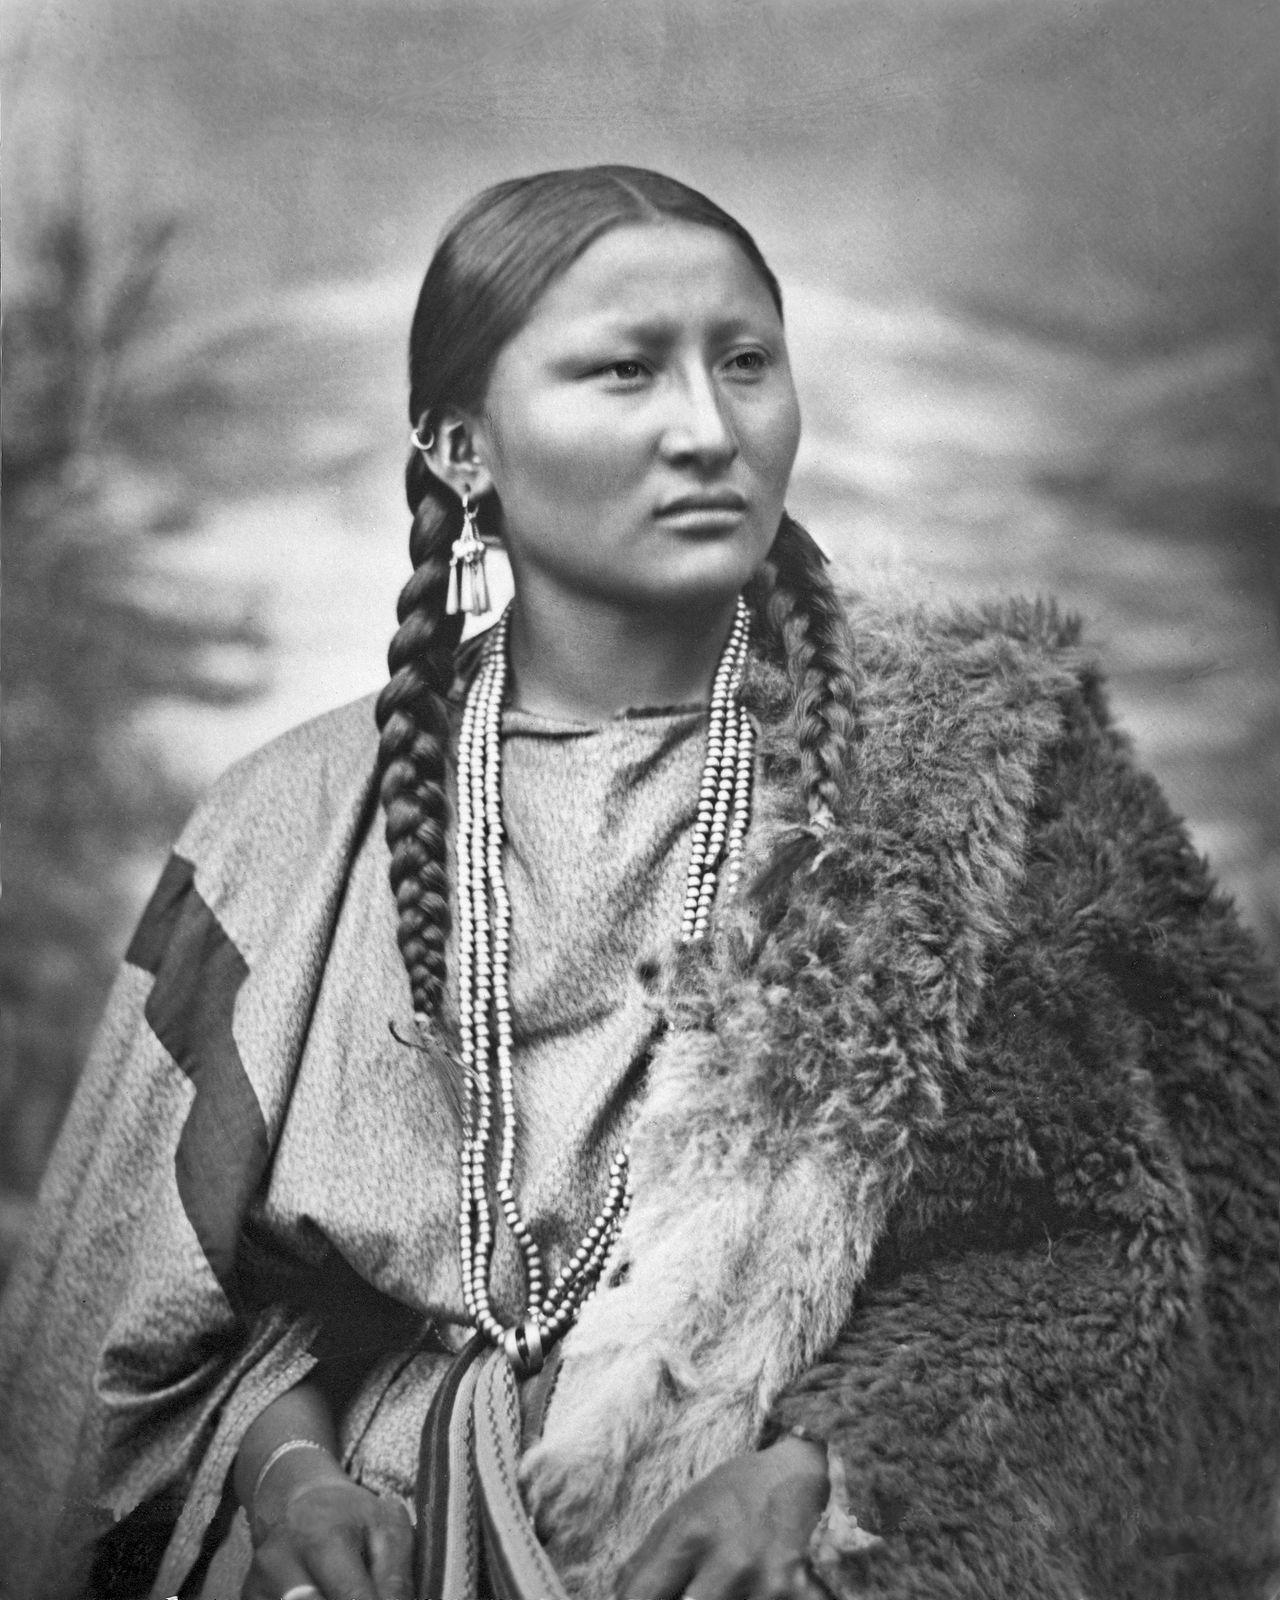 Cheyenne woman Pretty Nose restoredg